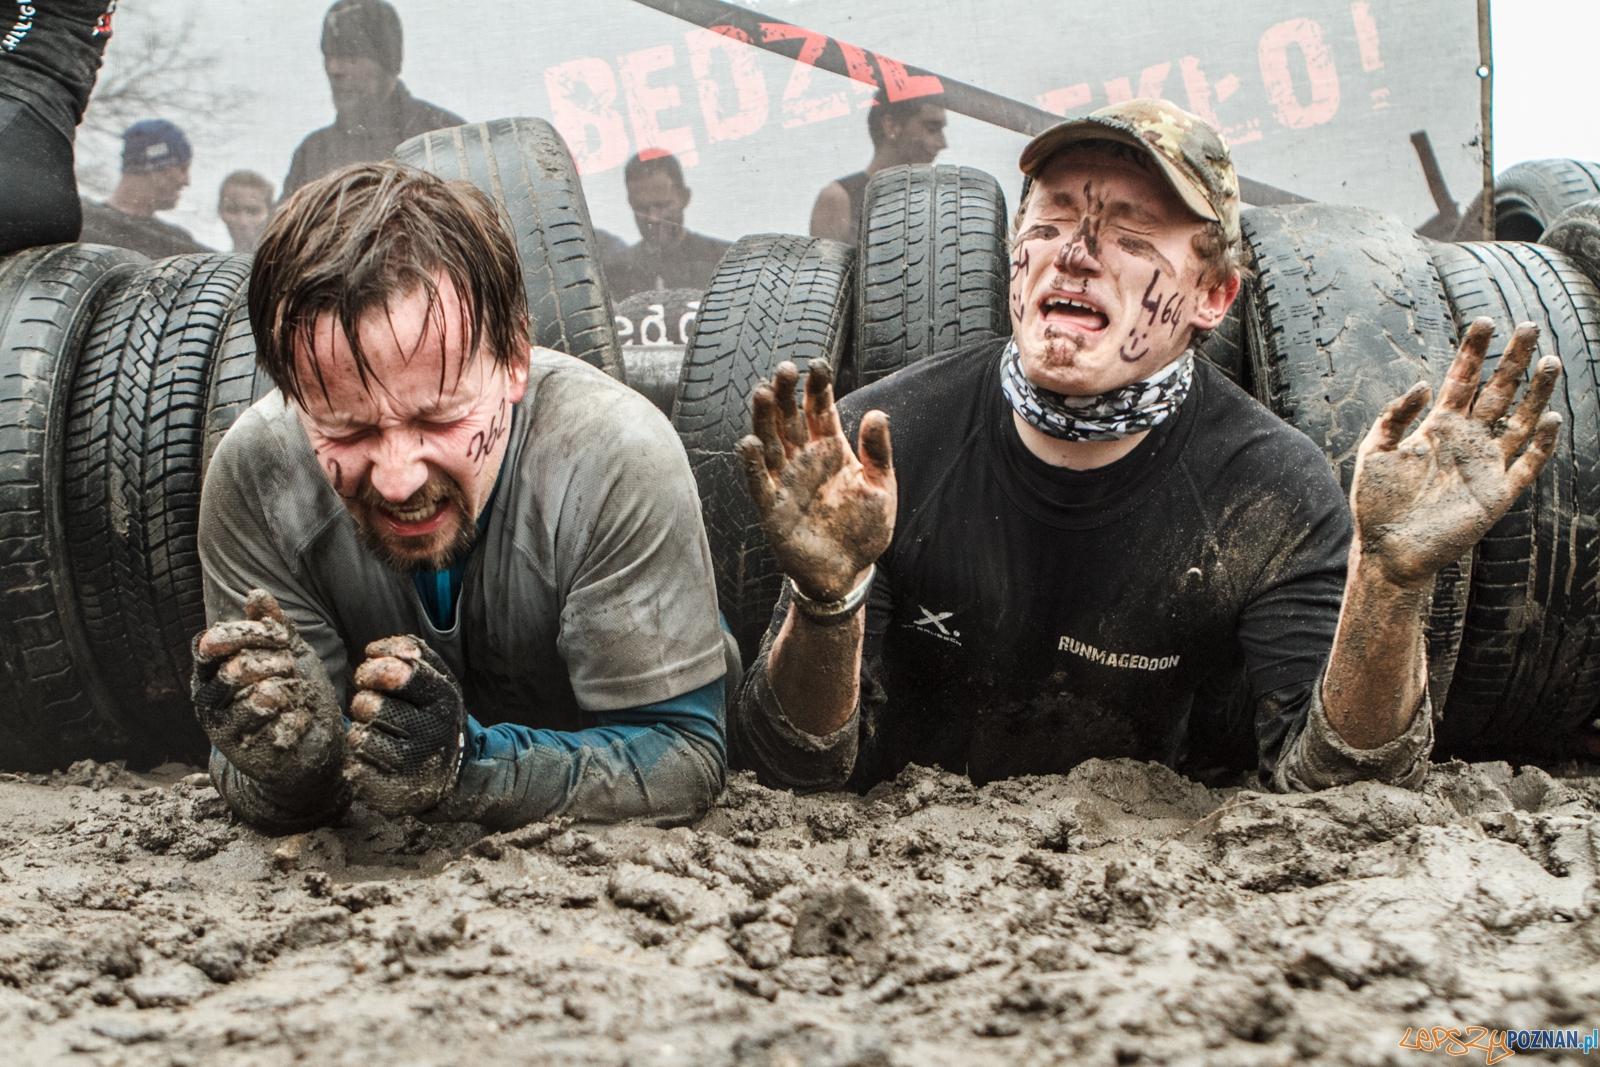 Runmageddon Rekrut Poznań - 7.11.2015 r.  Foto: LepszyPOZNAN.pl / Paweł Rychter